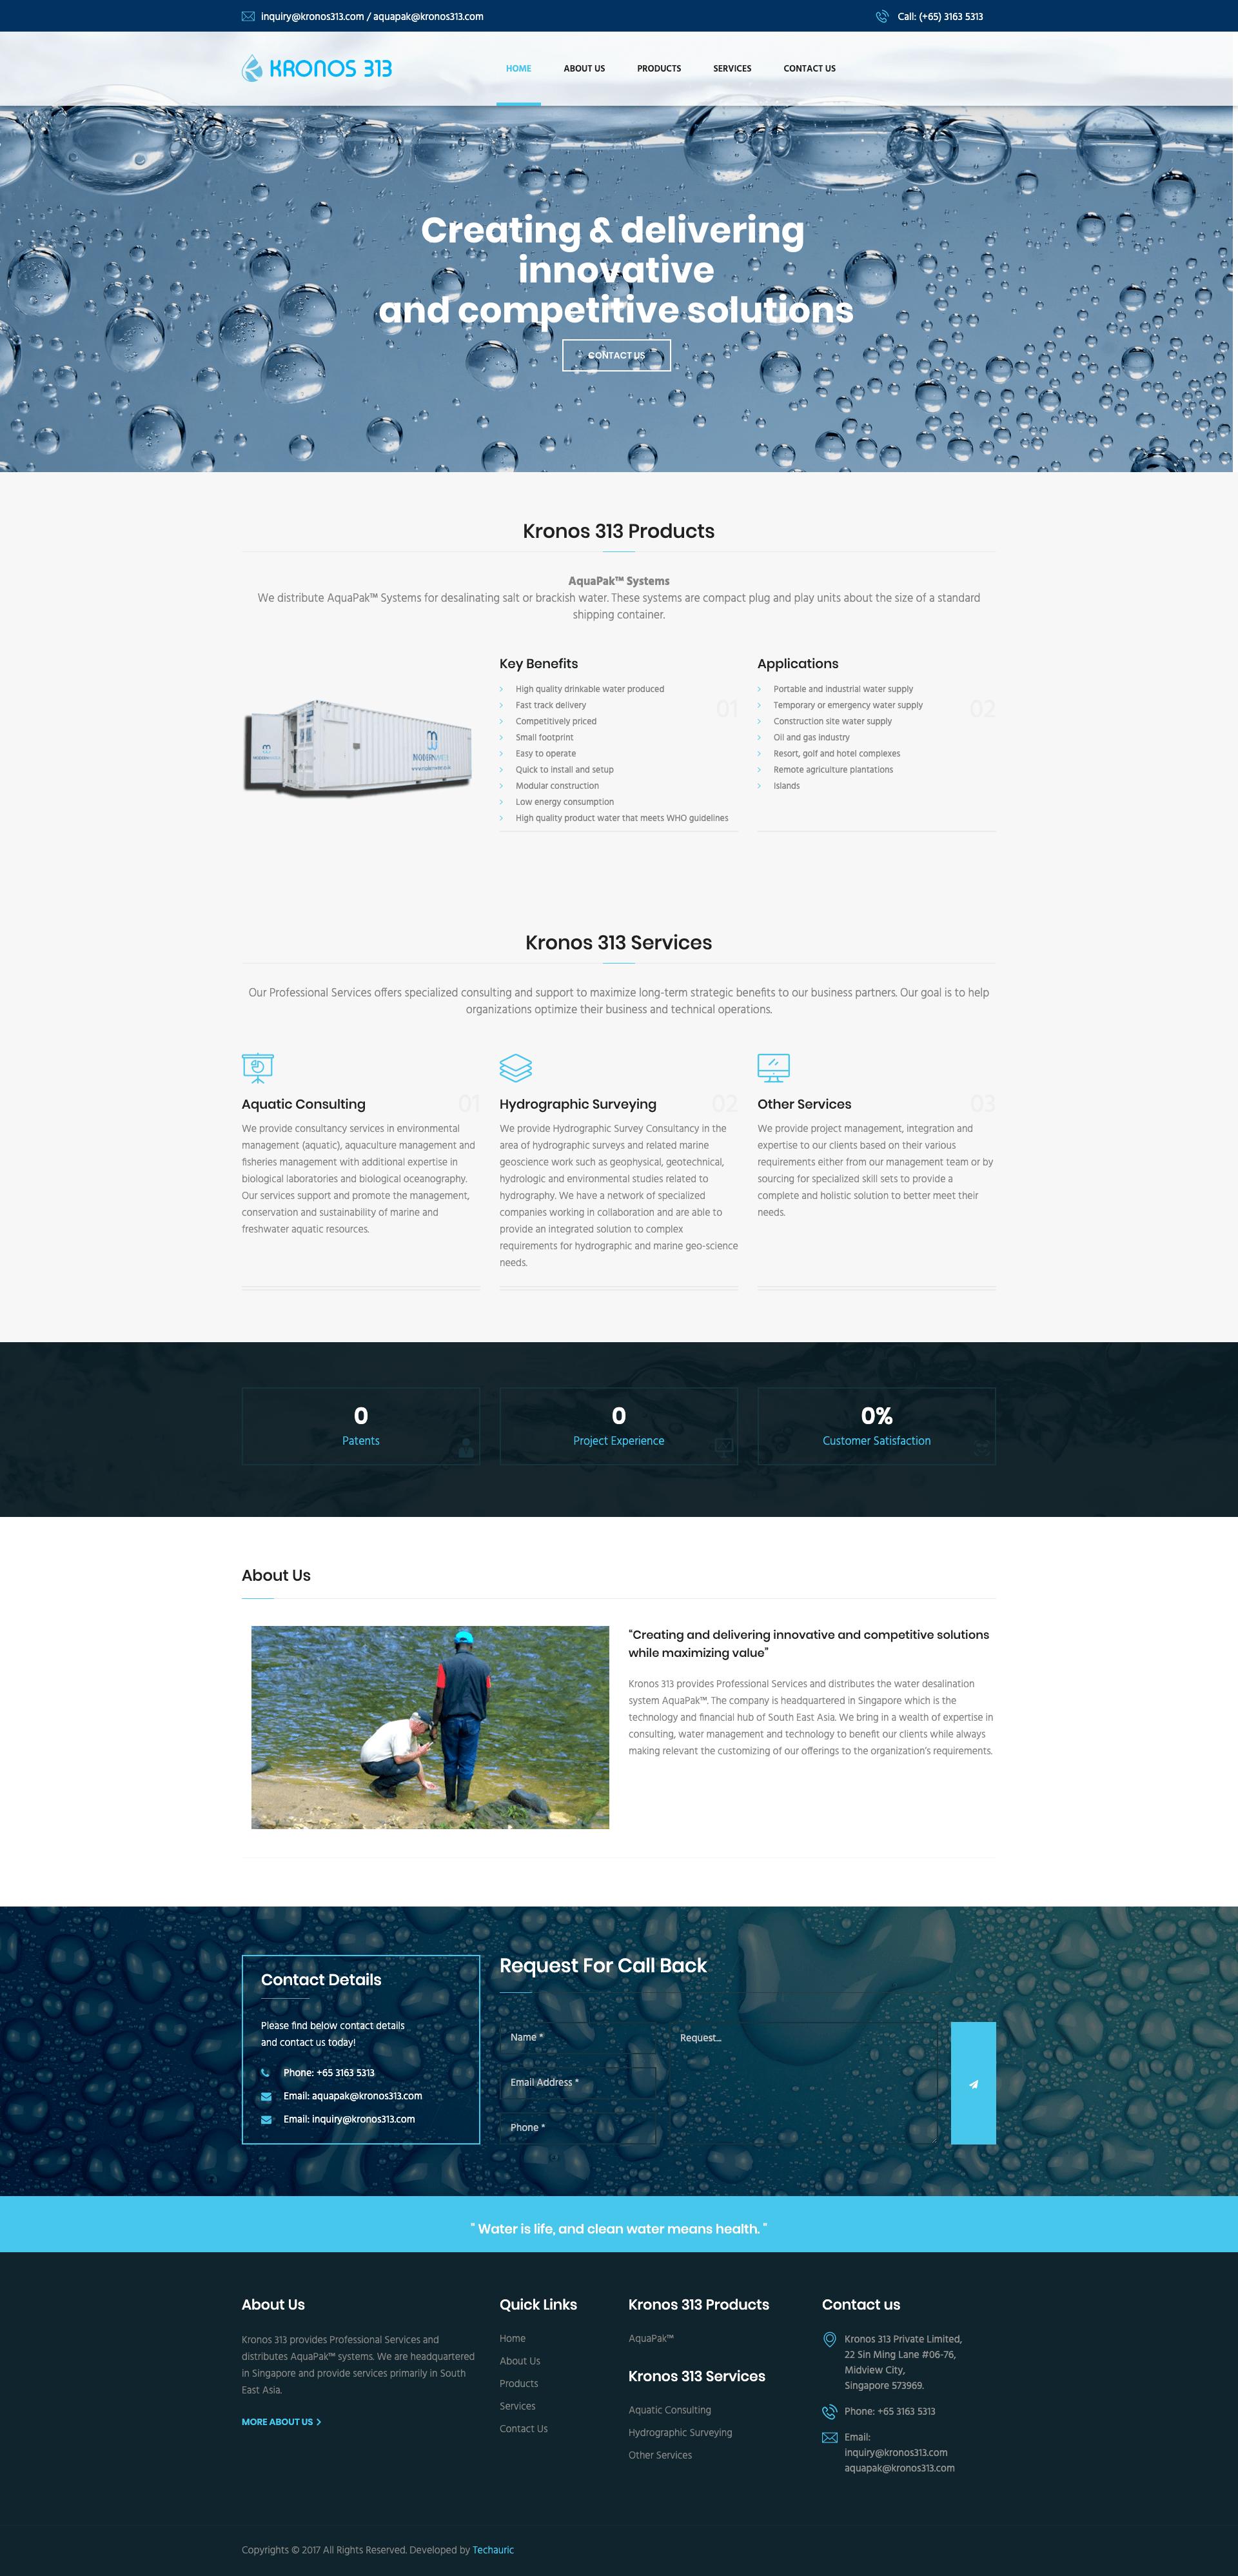 screencapture-kronos313-index-html-2019-05-30-15_09_11